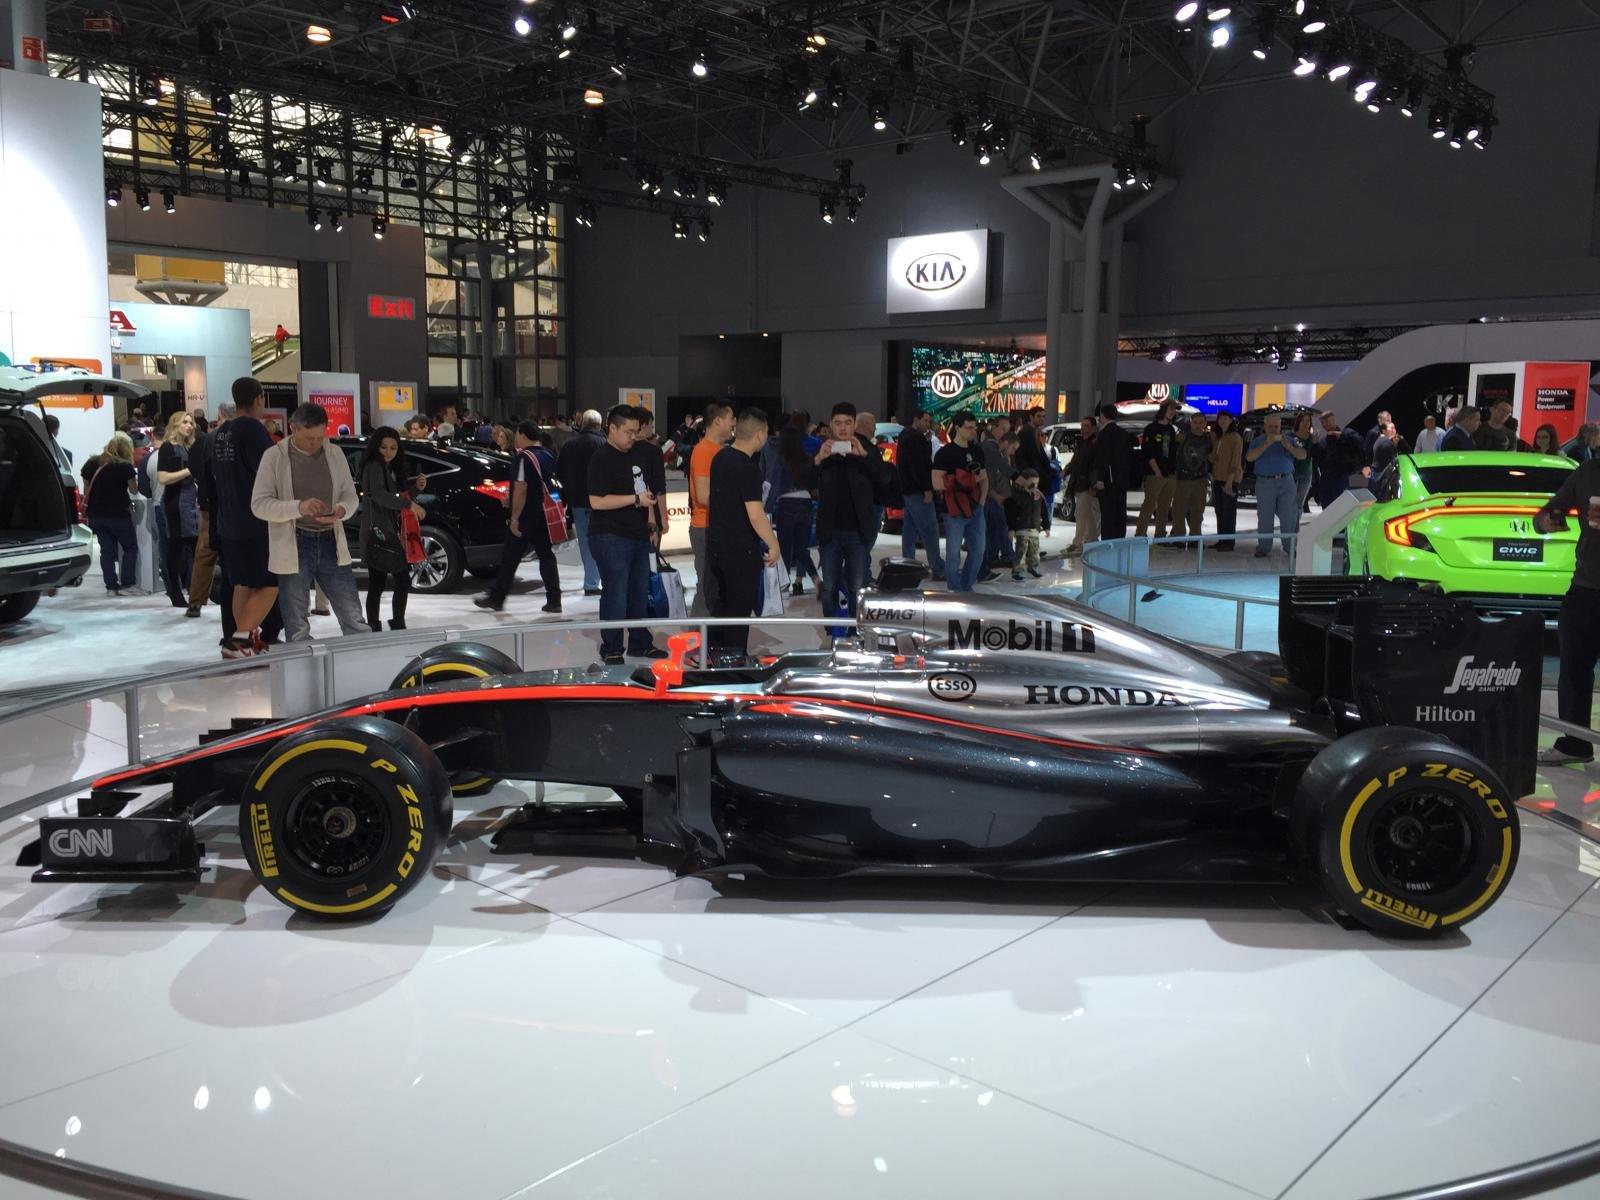 New York Auto Show Jacob Javits Center